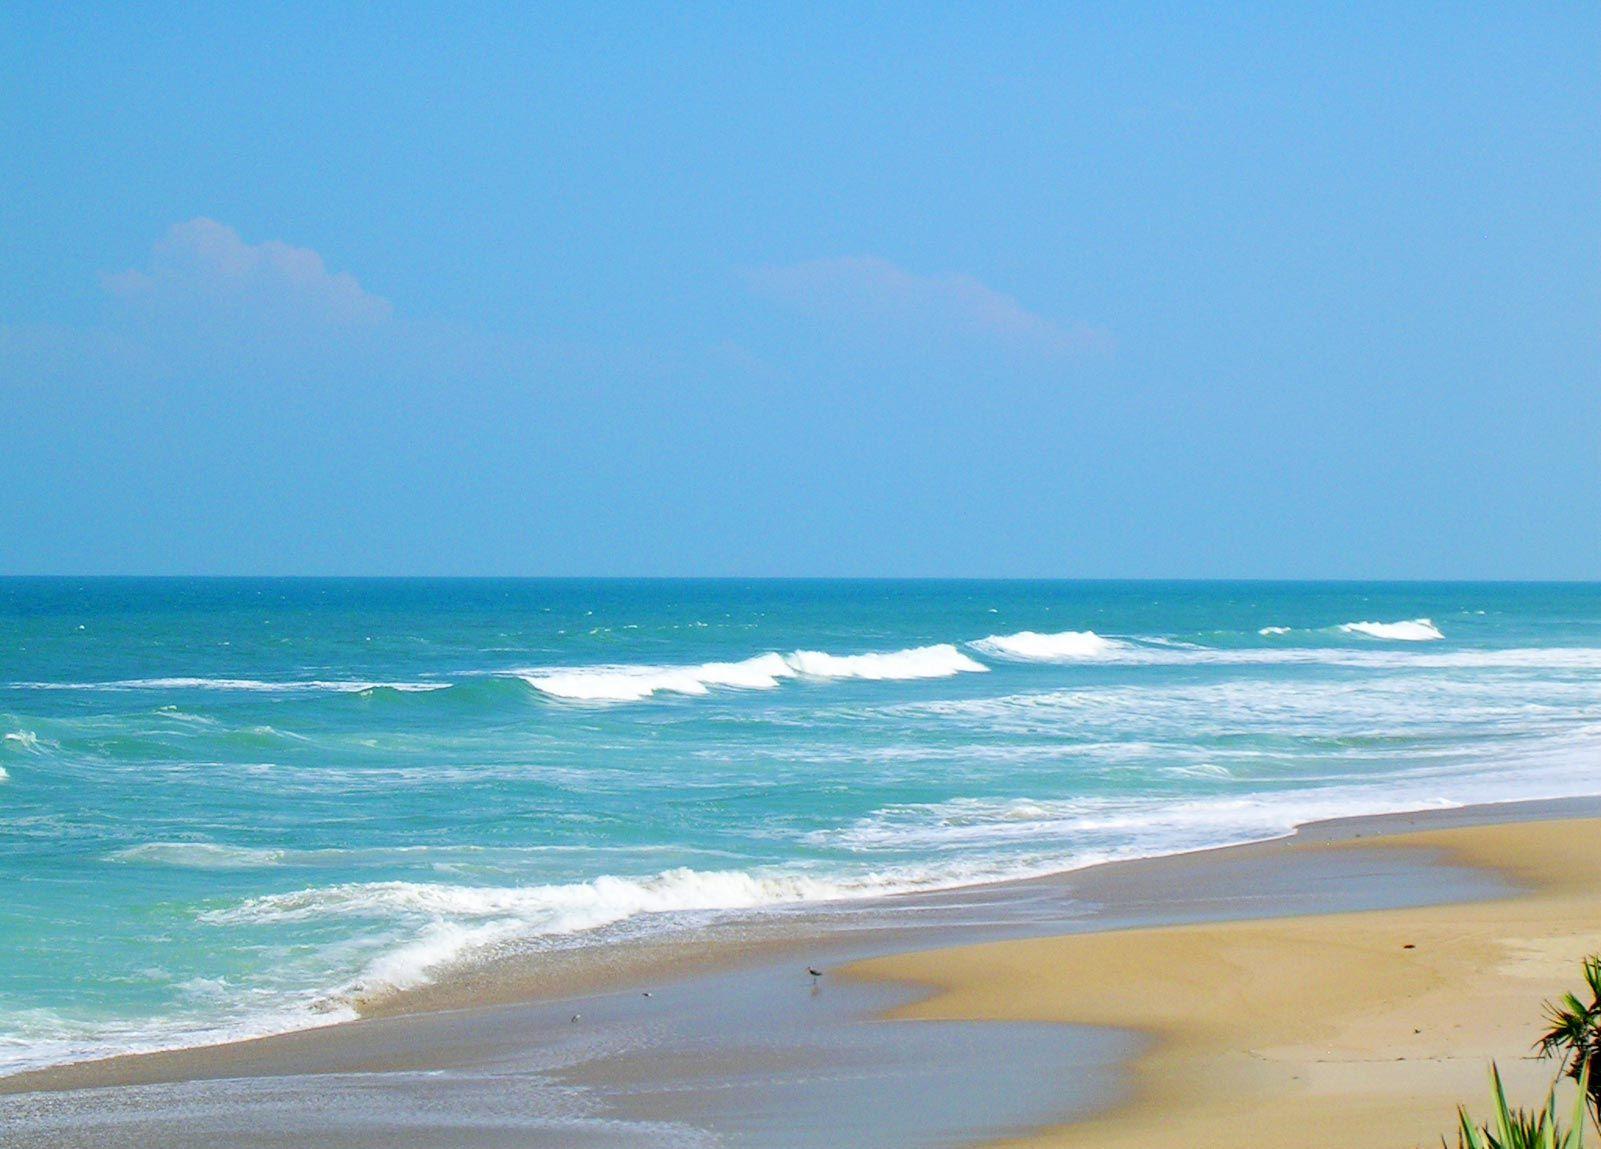 65c369953824e Cape Canaveral National Seashore Cape Canaveral Beach